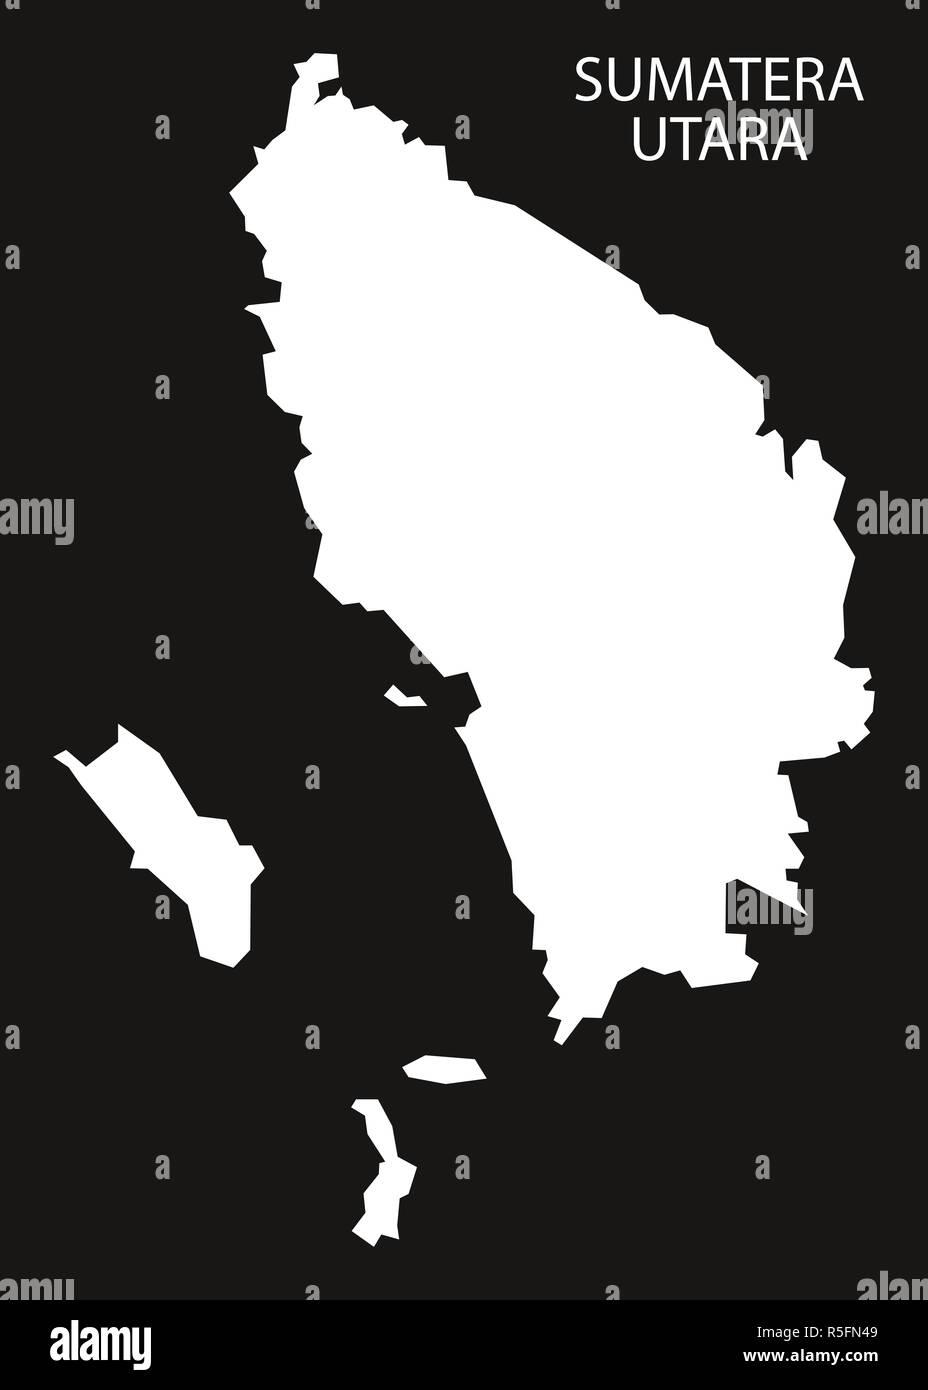 Peta Indonesia Siluet : indonesia, siluet, Sumatra, Utara, Indonesia, Invertido, Forma, Ilustración, Silueta, Negra, Fotografía, Stock, Alamy